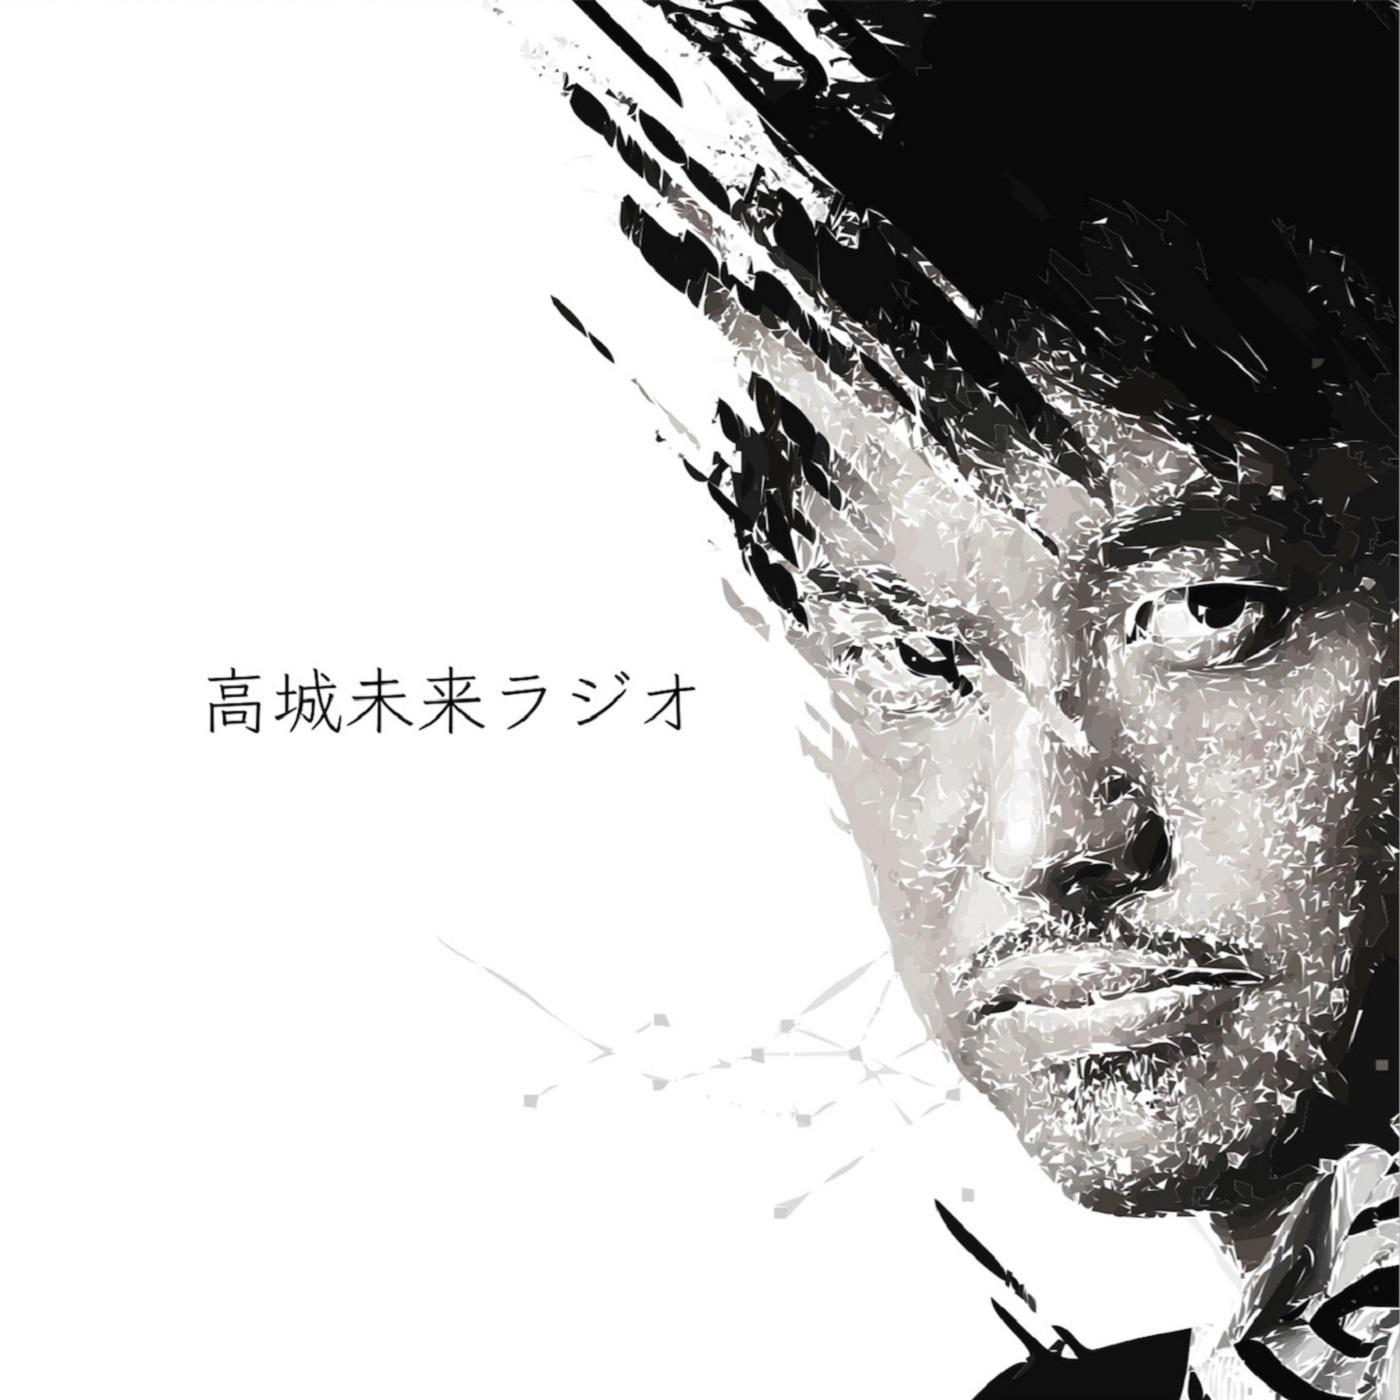 第57回 暗躍の限界 -佐々木さん(仮名)/大手広告代理店現役部長 後編